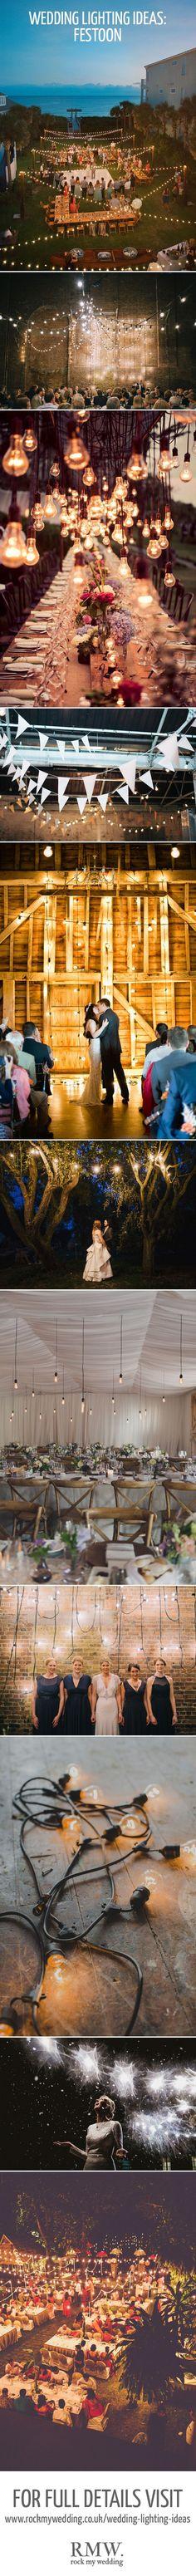 backyard wedding lighting best photos - backyard wedding  - cuteweddingideas.com